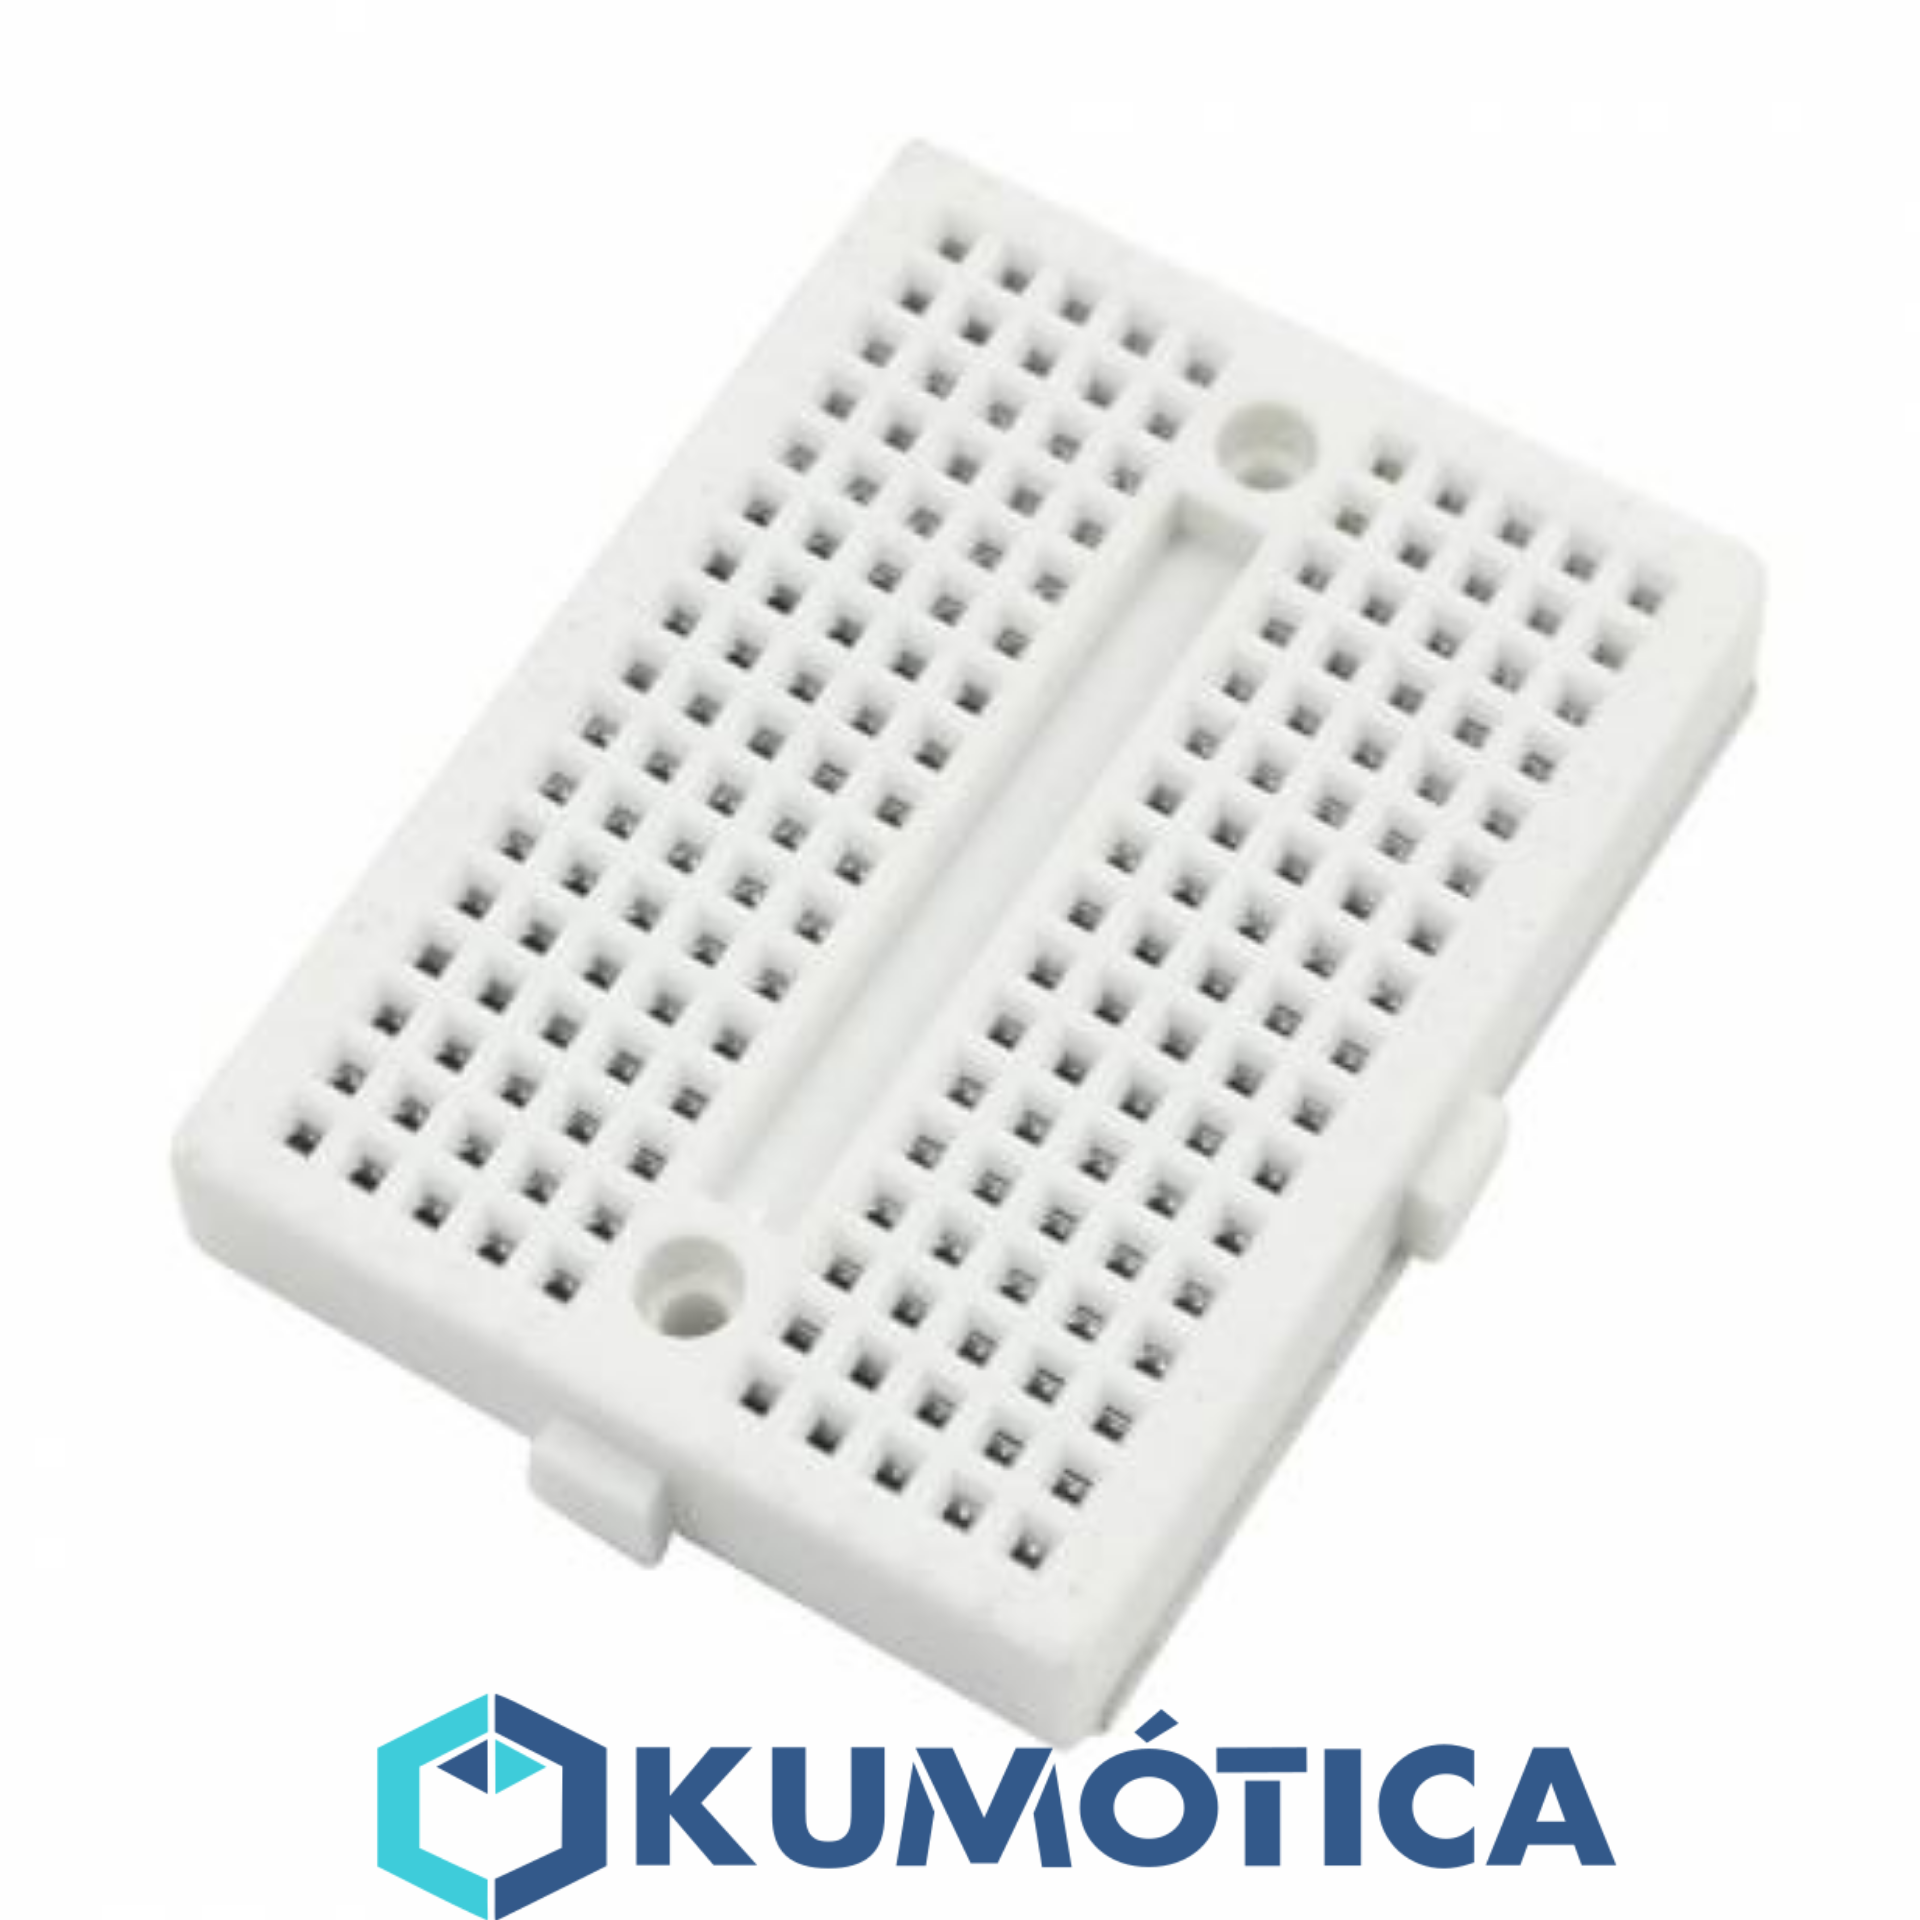 Breadboard Breadboard 170 Pin, Connection Board For Arduino Projects From Electronics/Rasperri Pi